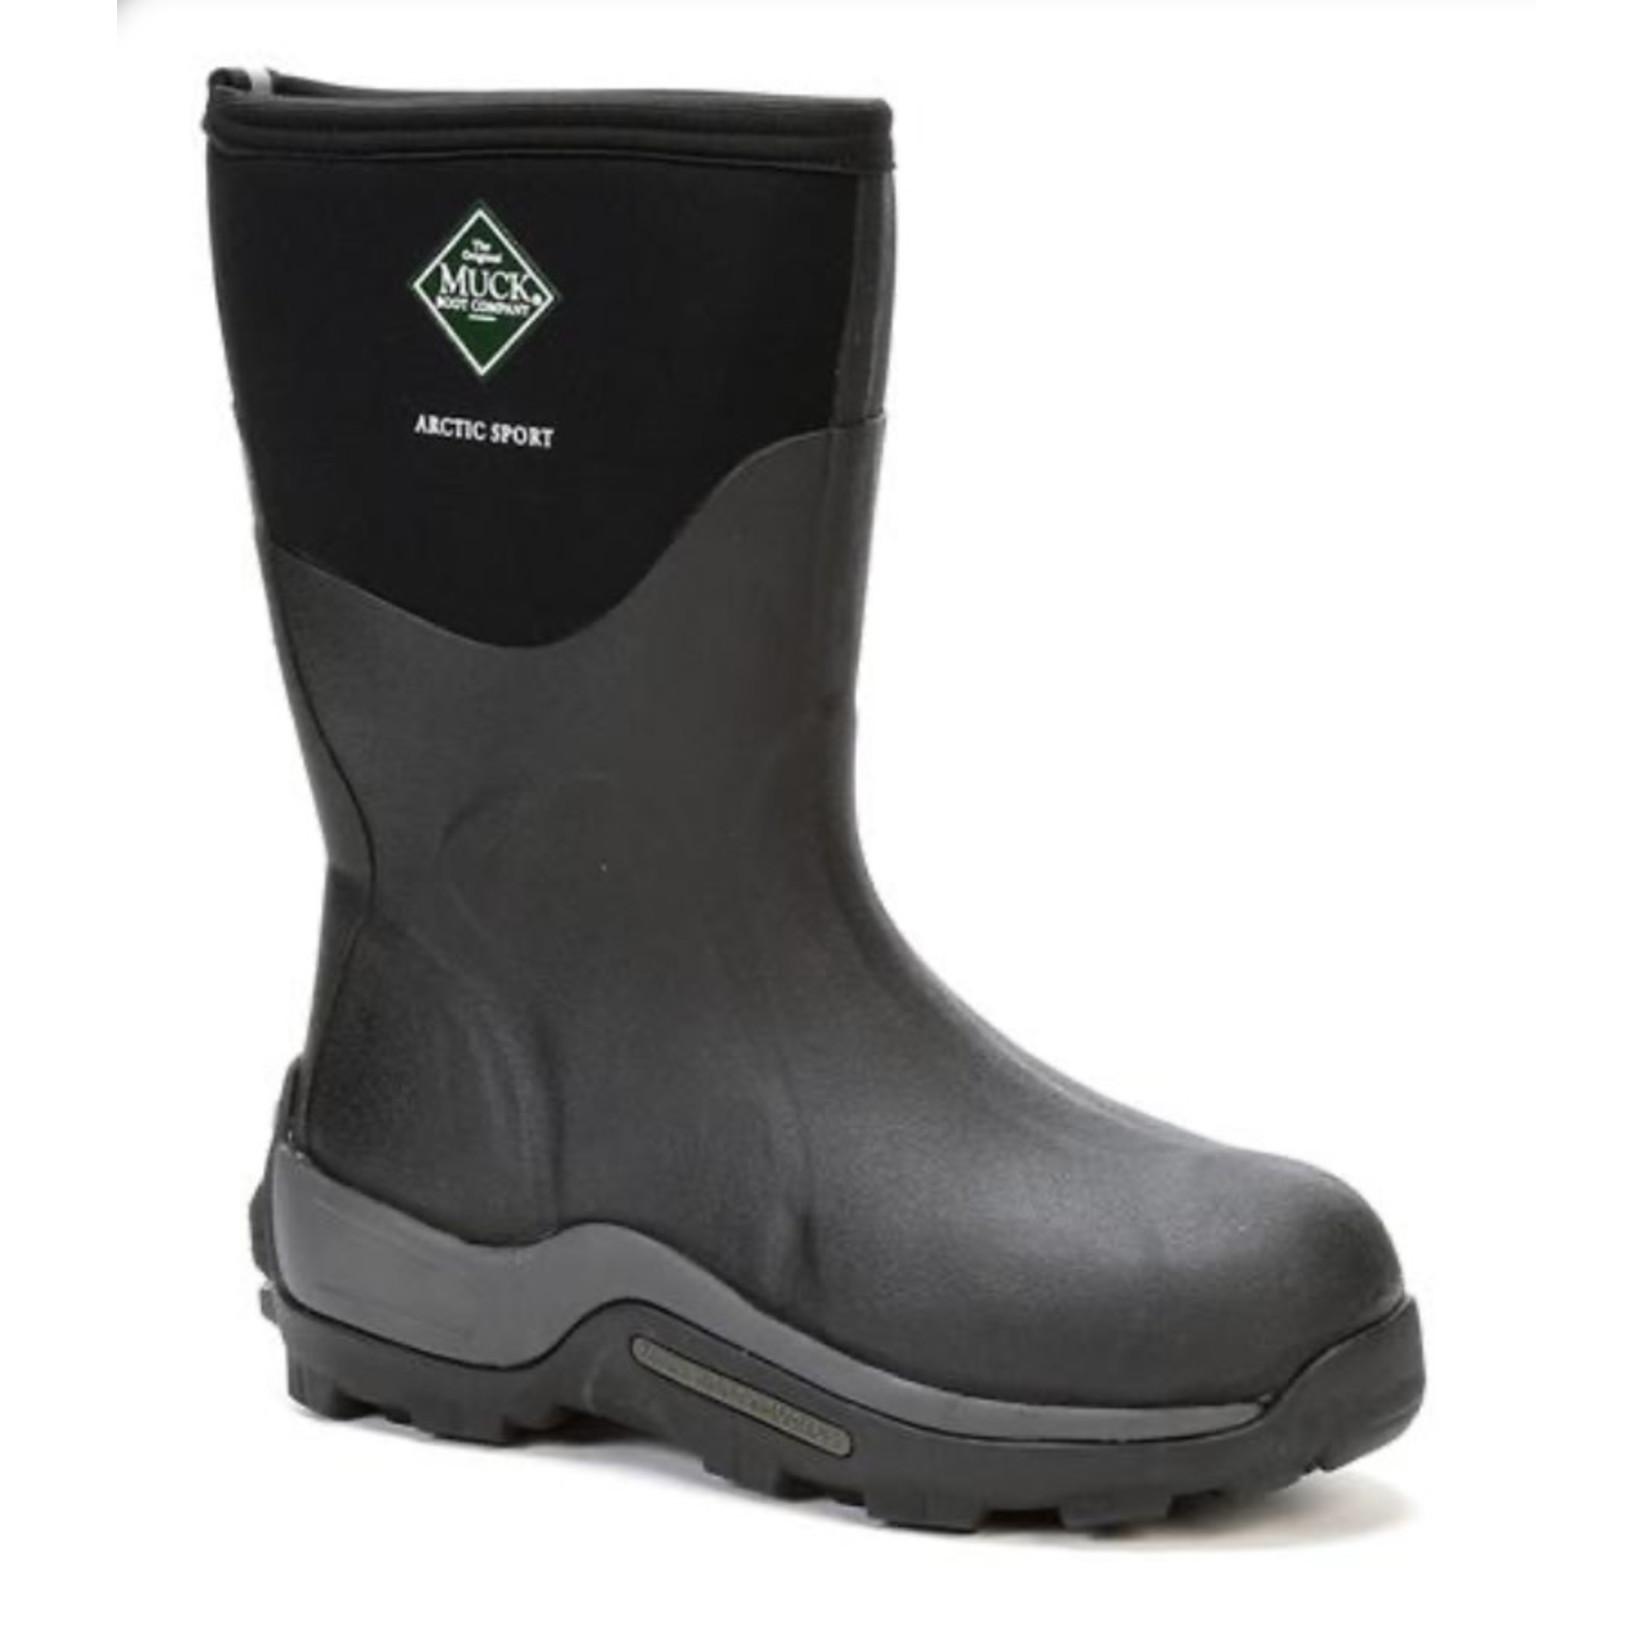 Muck Muck Arctic Sport Soft Toe Mid -40 Fleece Lined Rubber Boot Black ASM-000A-BLK